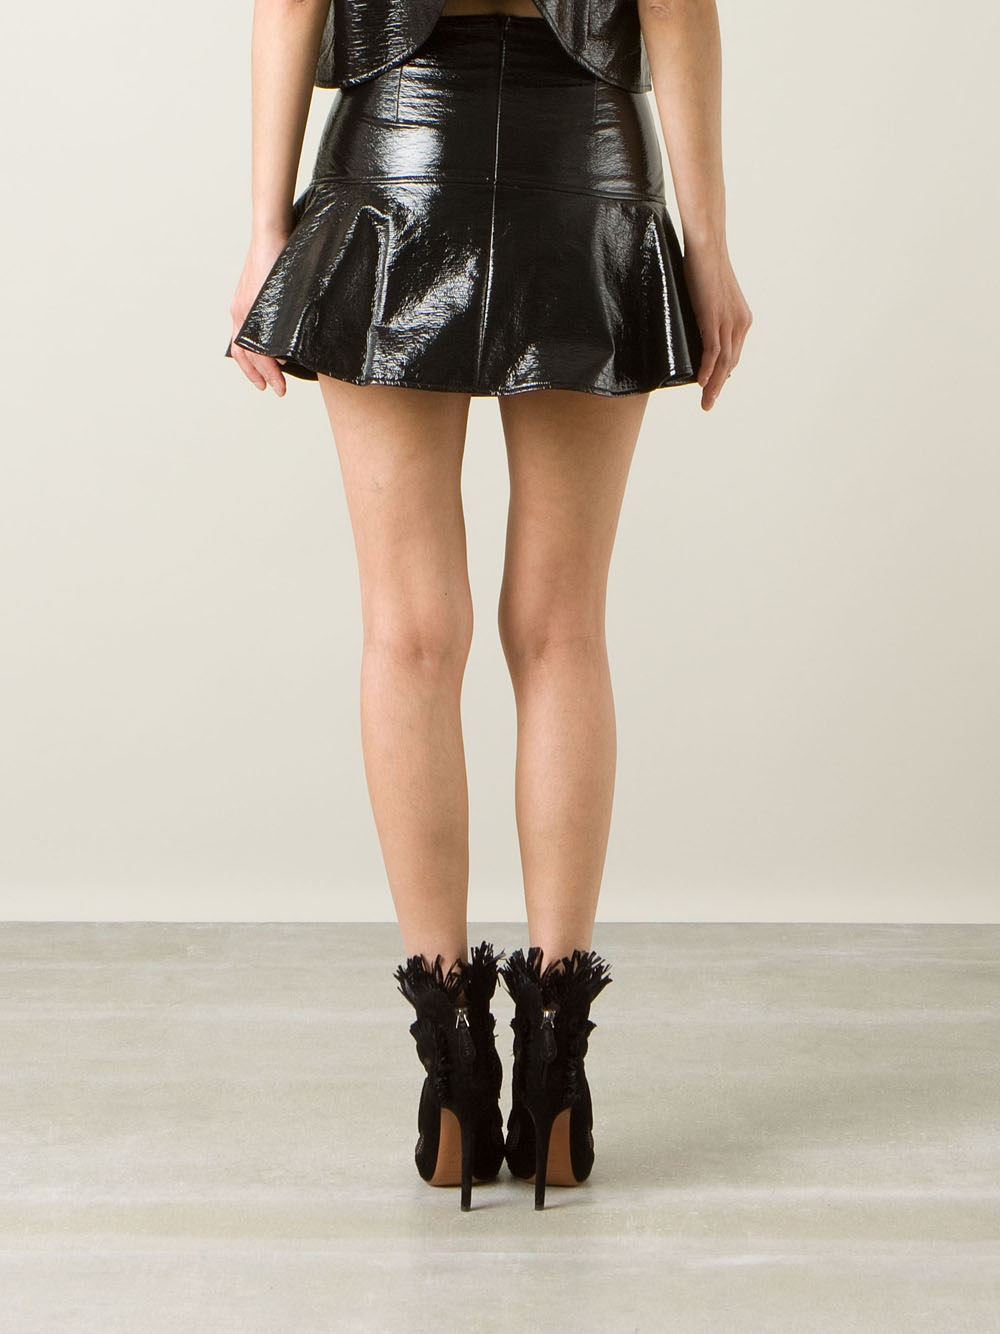 Wanda Nylon Shiny Miniskirt In Black Lyst